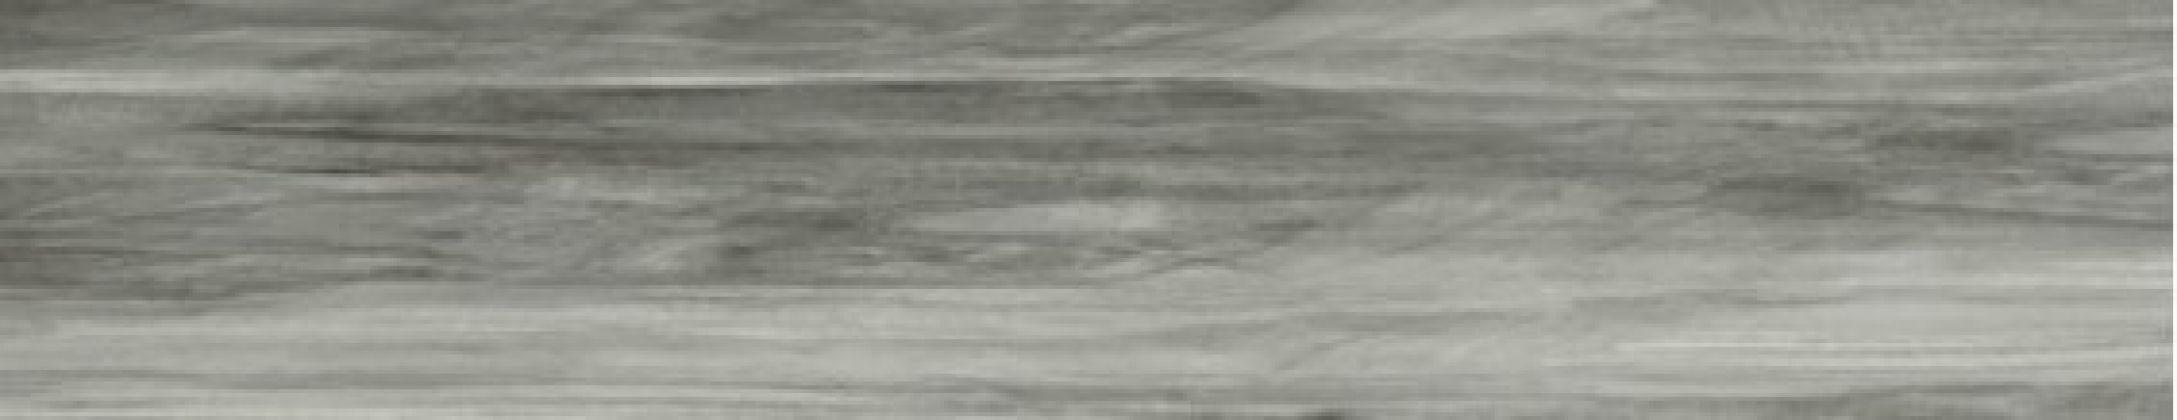 HENSA Gris Brillo Rect 22,5x119,5